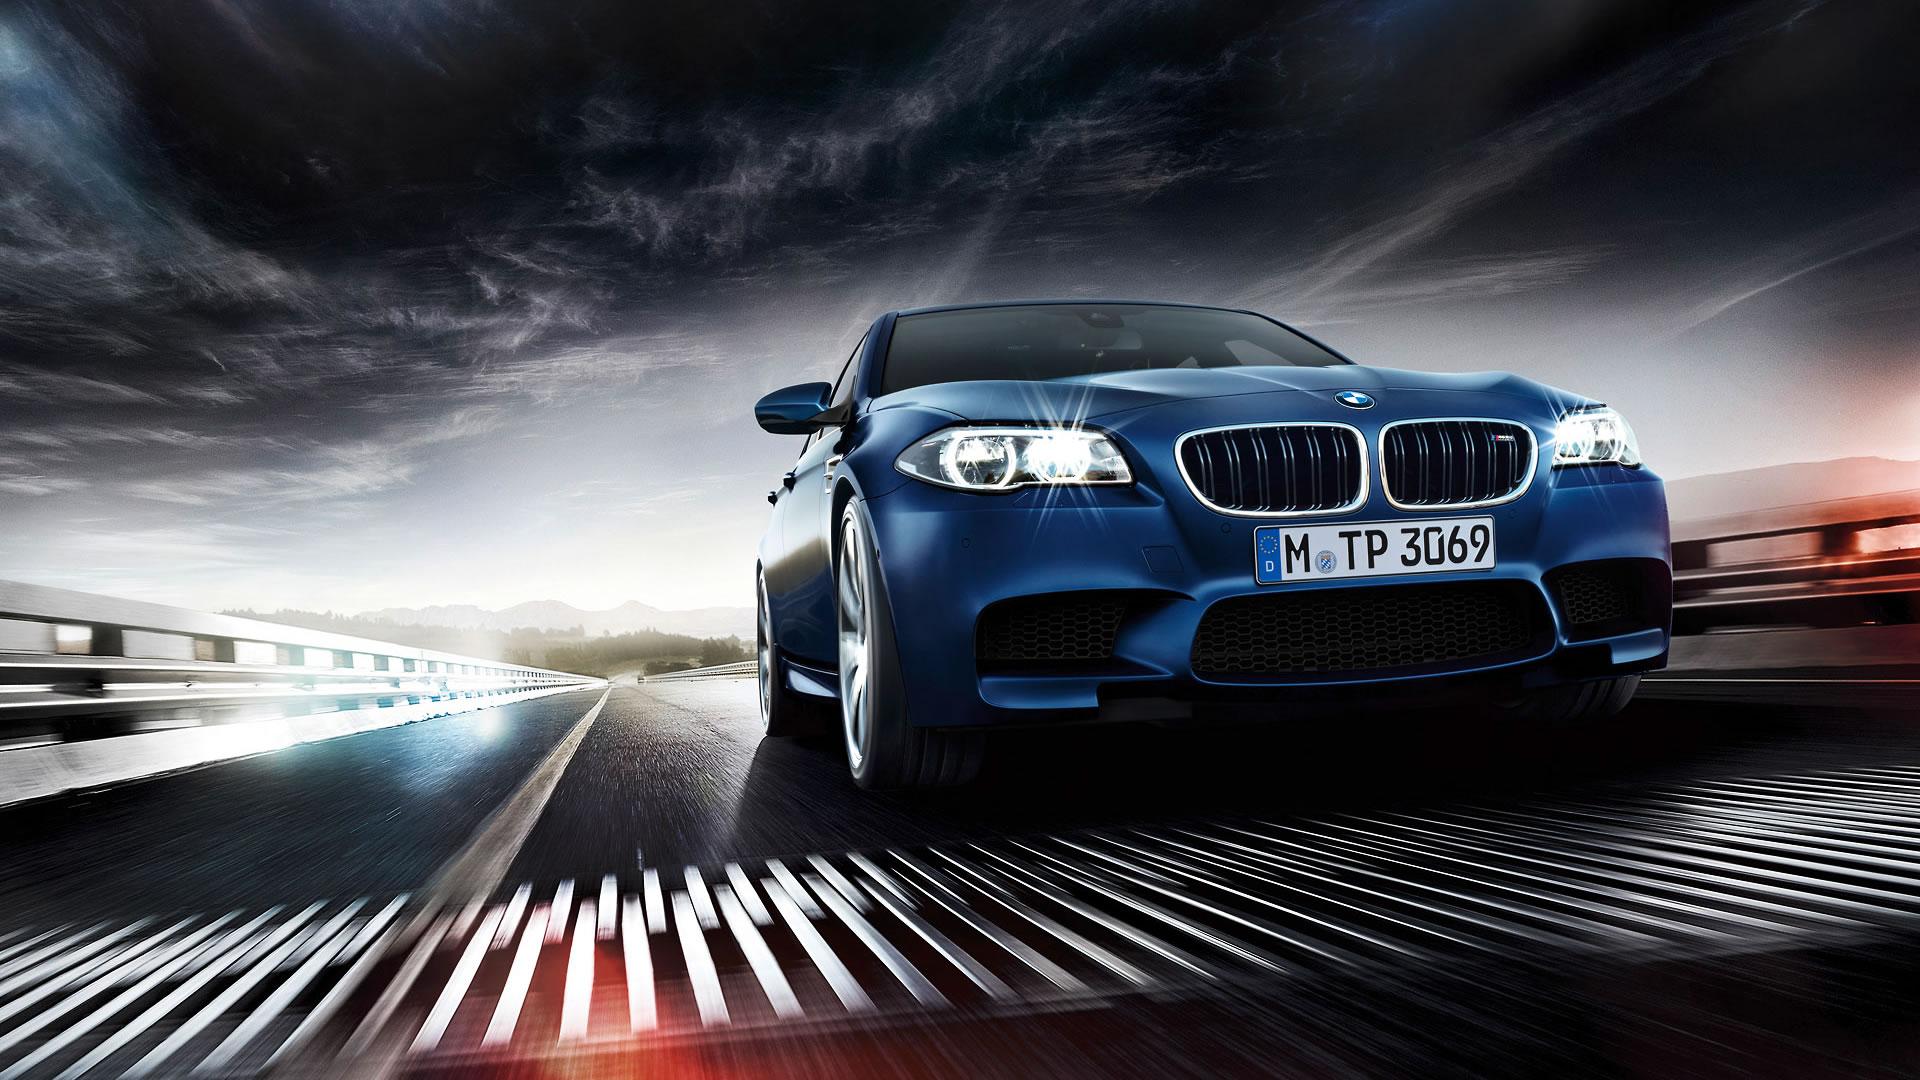 BMW Sports Cars Wallpapers Download Desktop Wallpaper Images 1920x1080